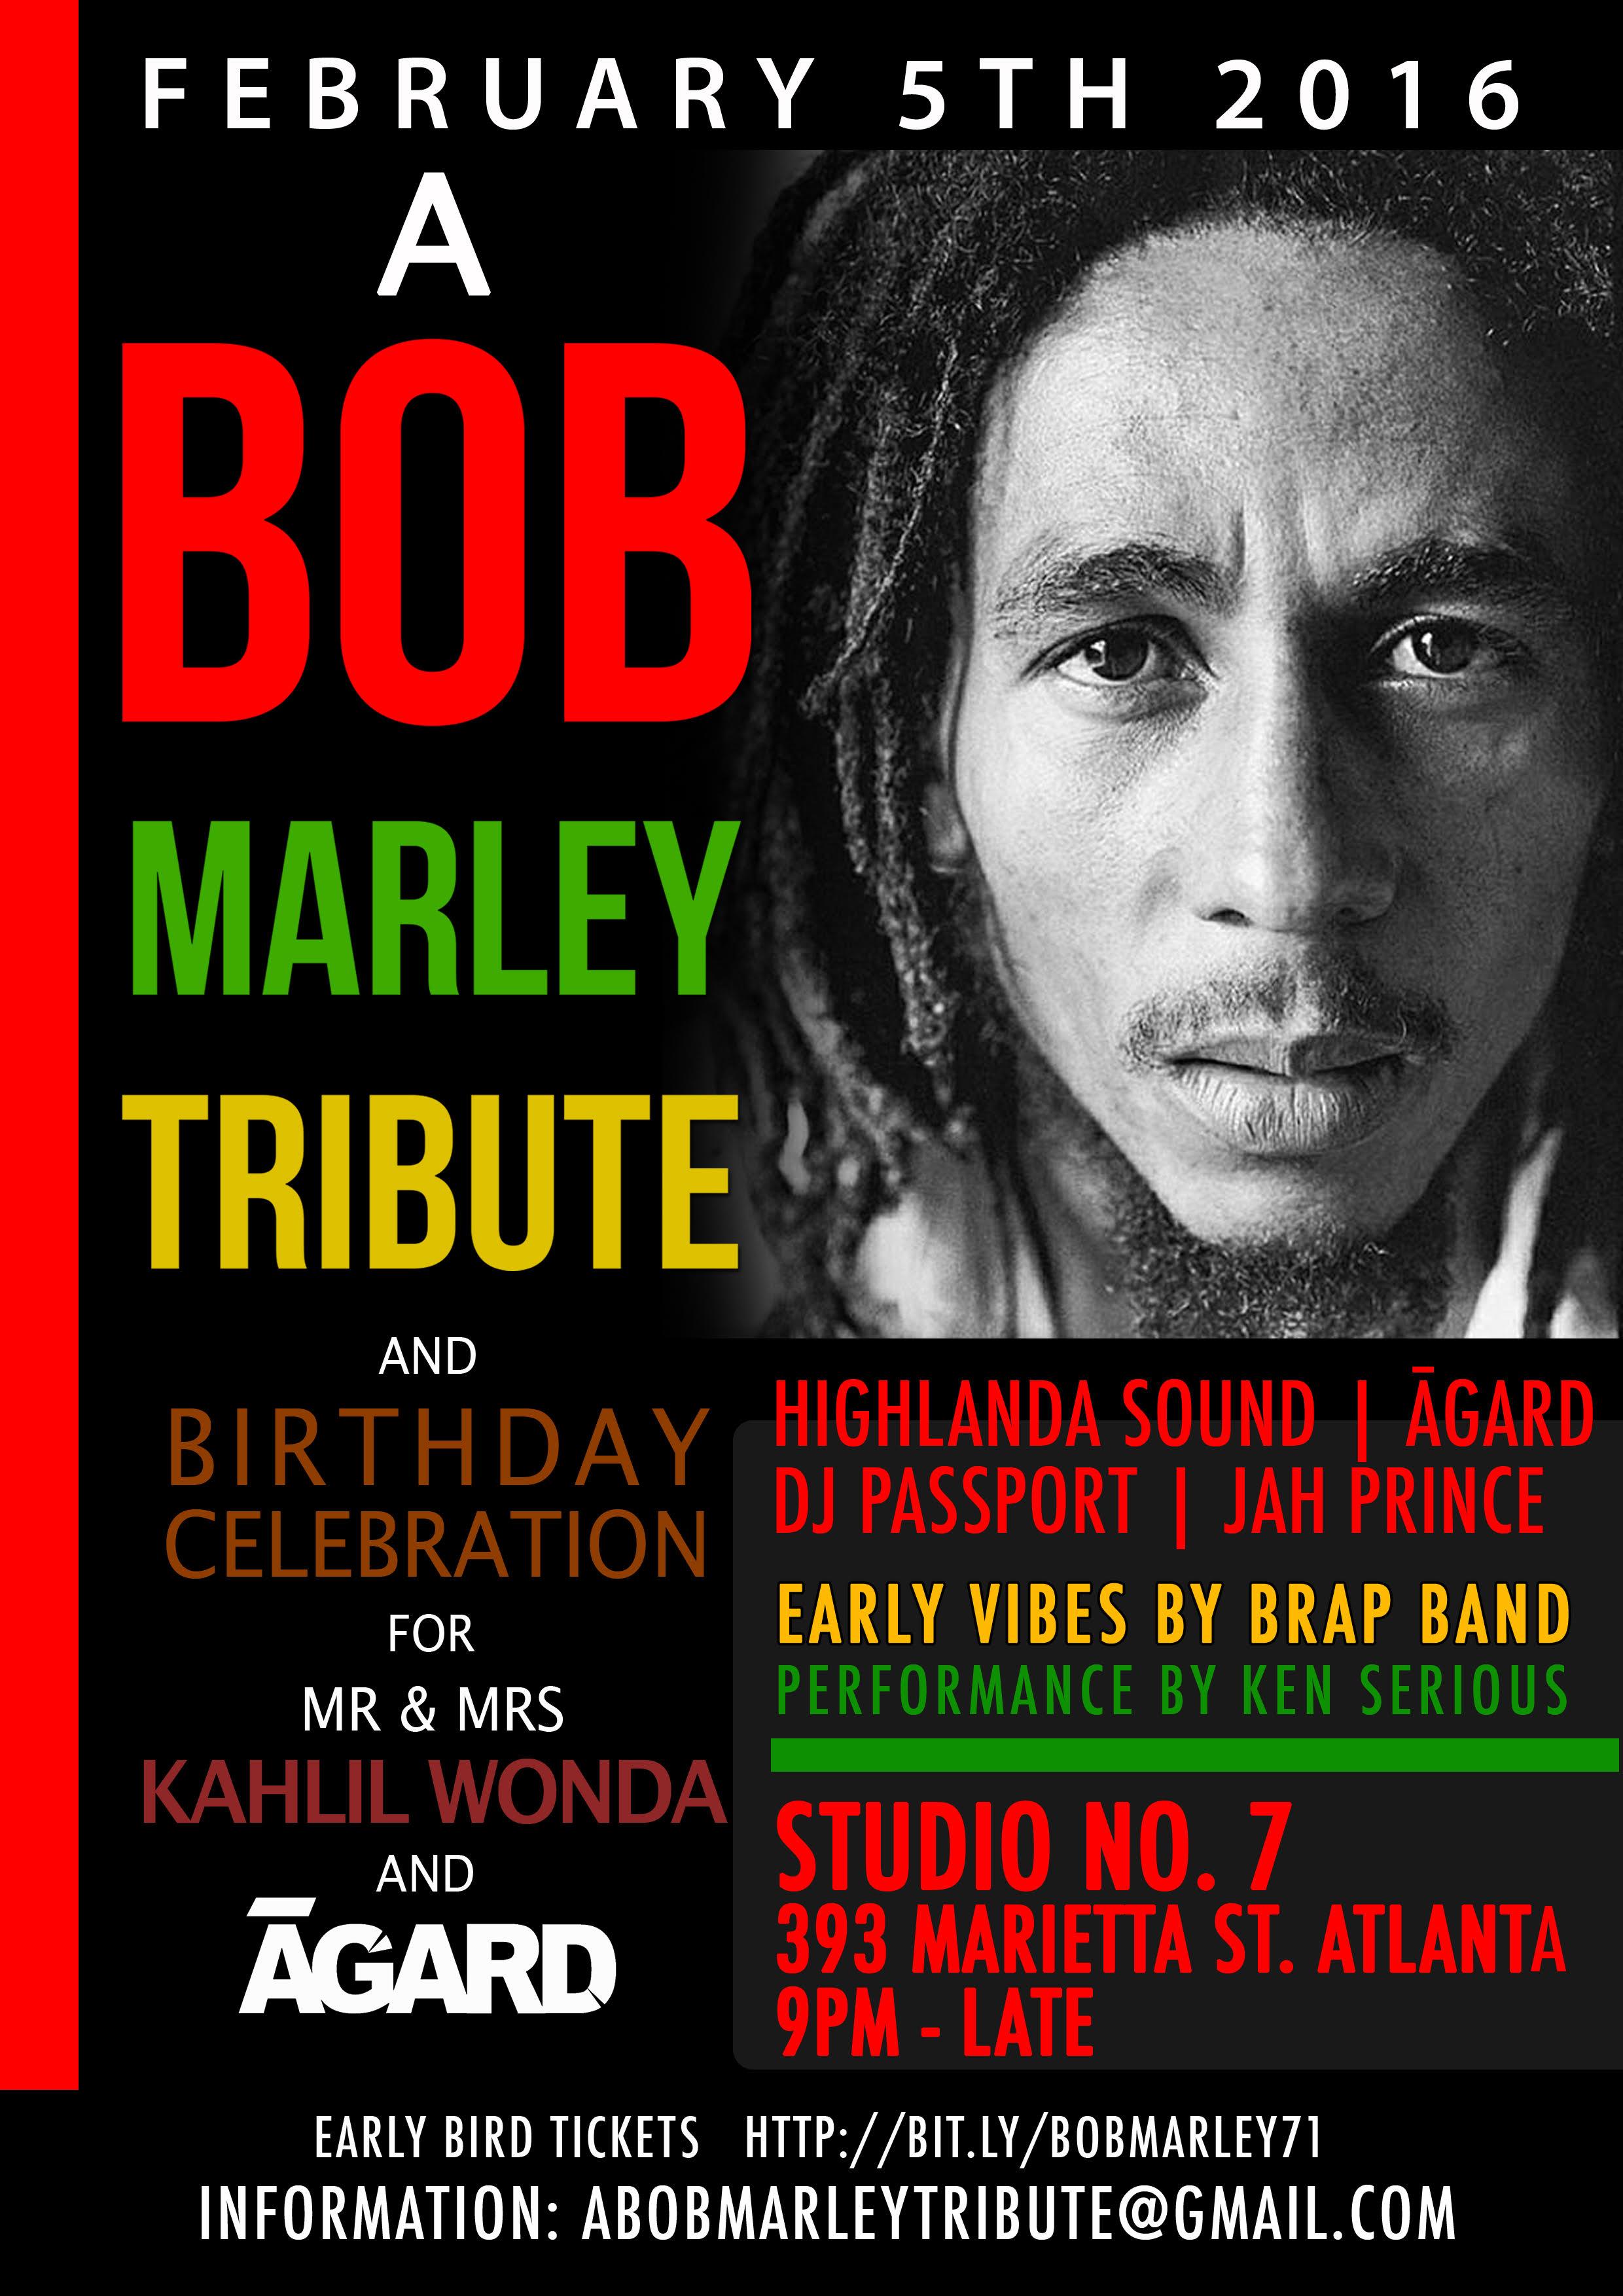 Rocksteady ATL Announces 2nd Annual Bob Marley Birthday Bash and Aquarius Celebration